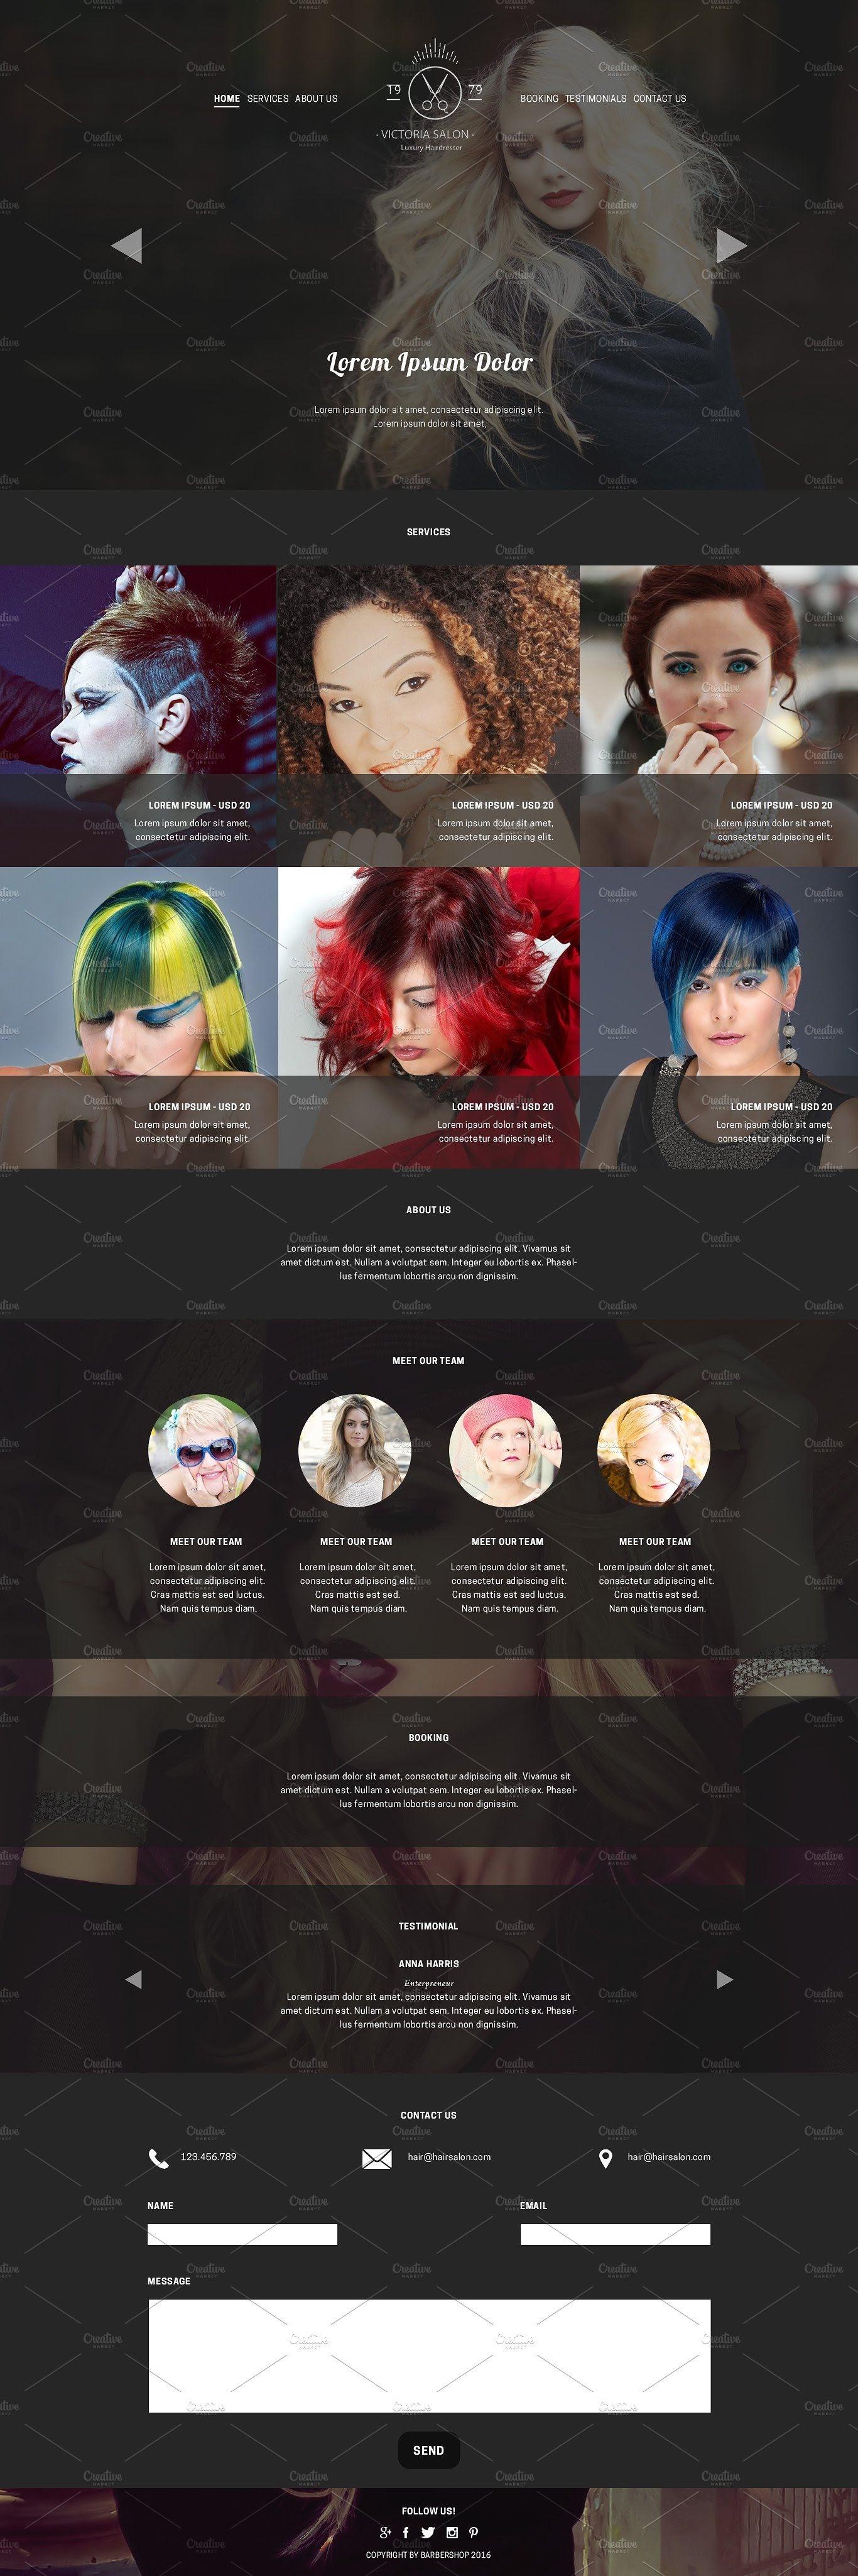 Hair Salon Psd Website Template 677125 Sourcepsd Com